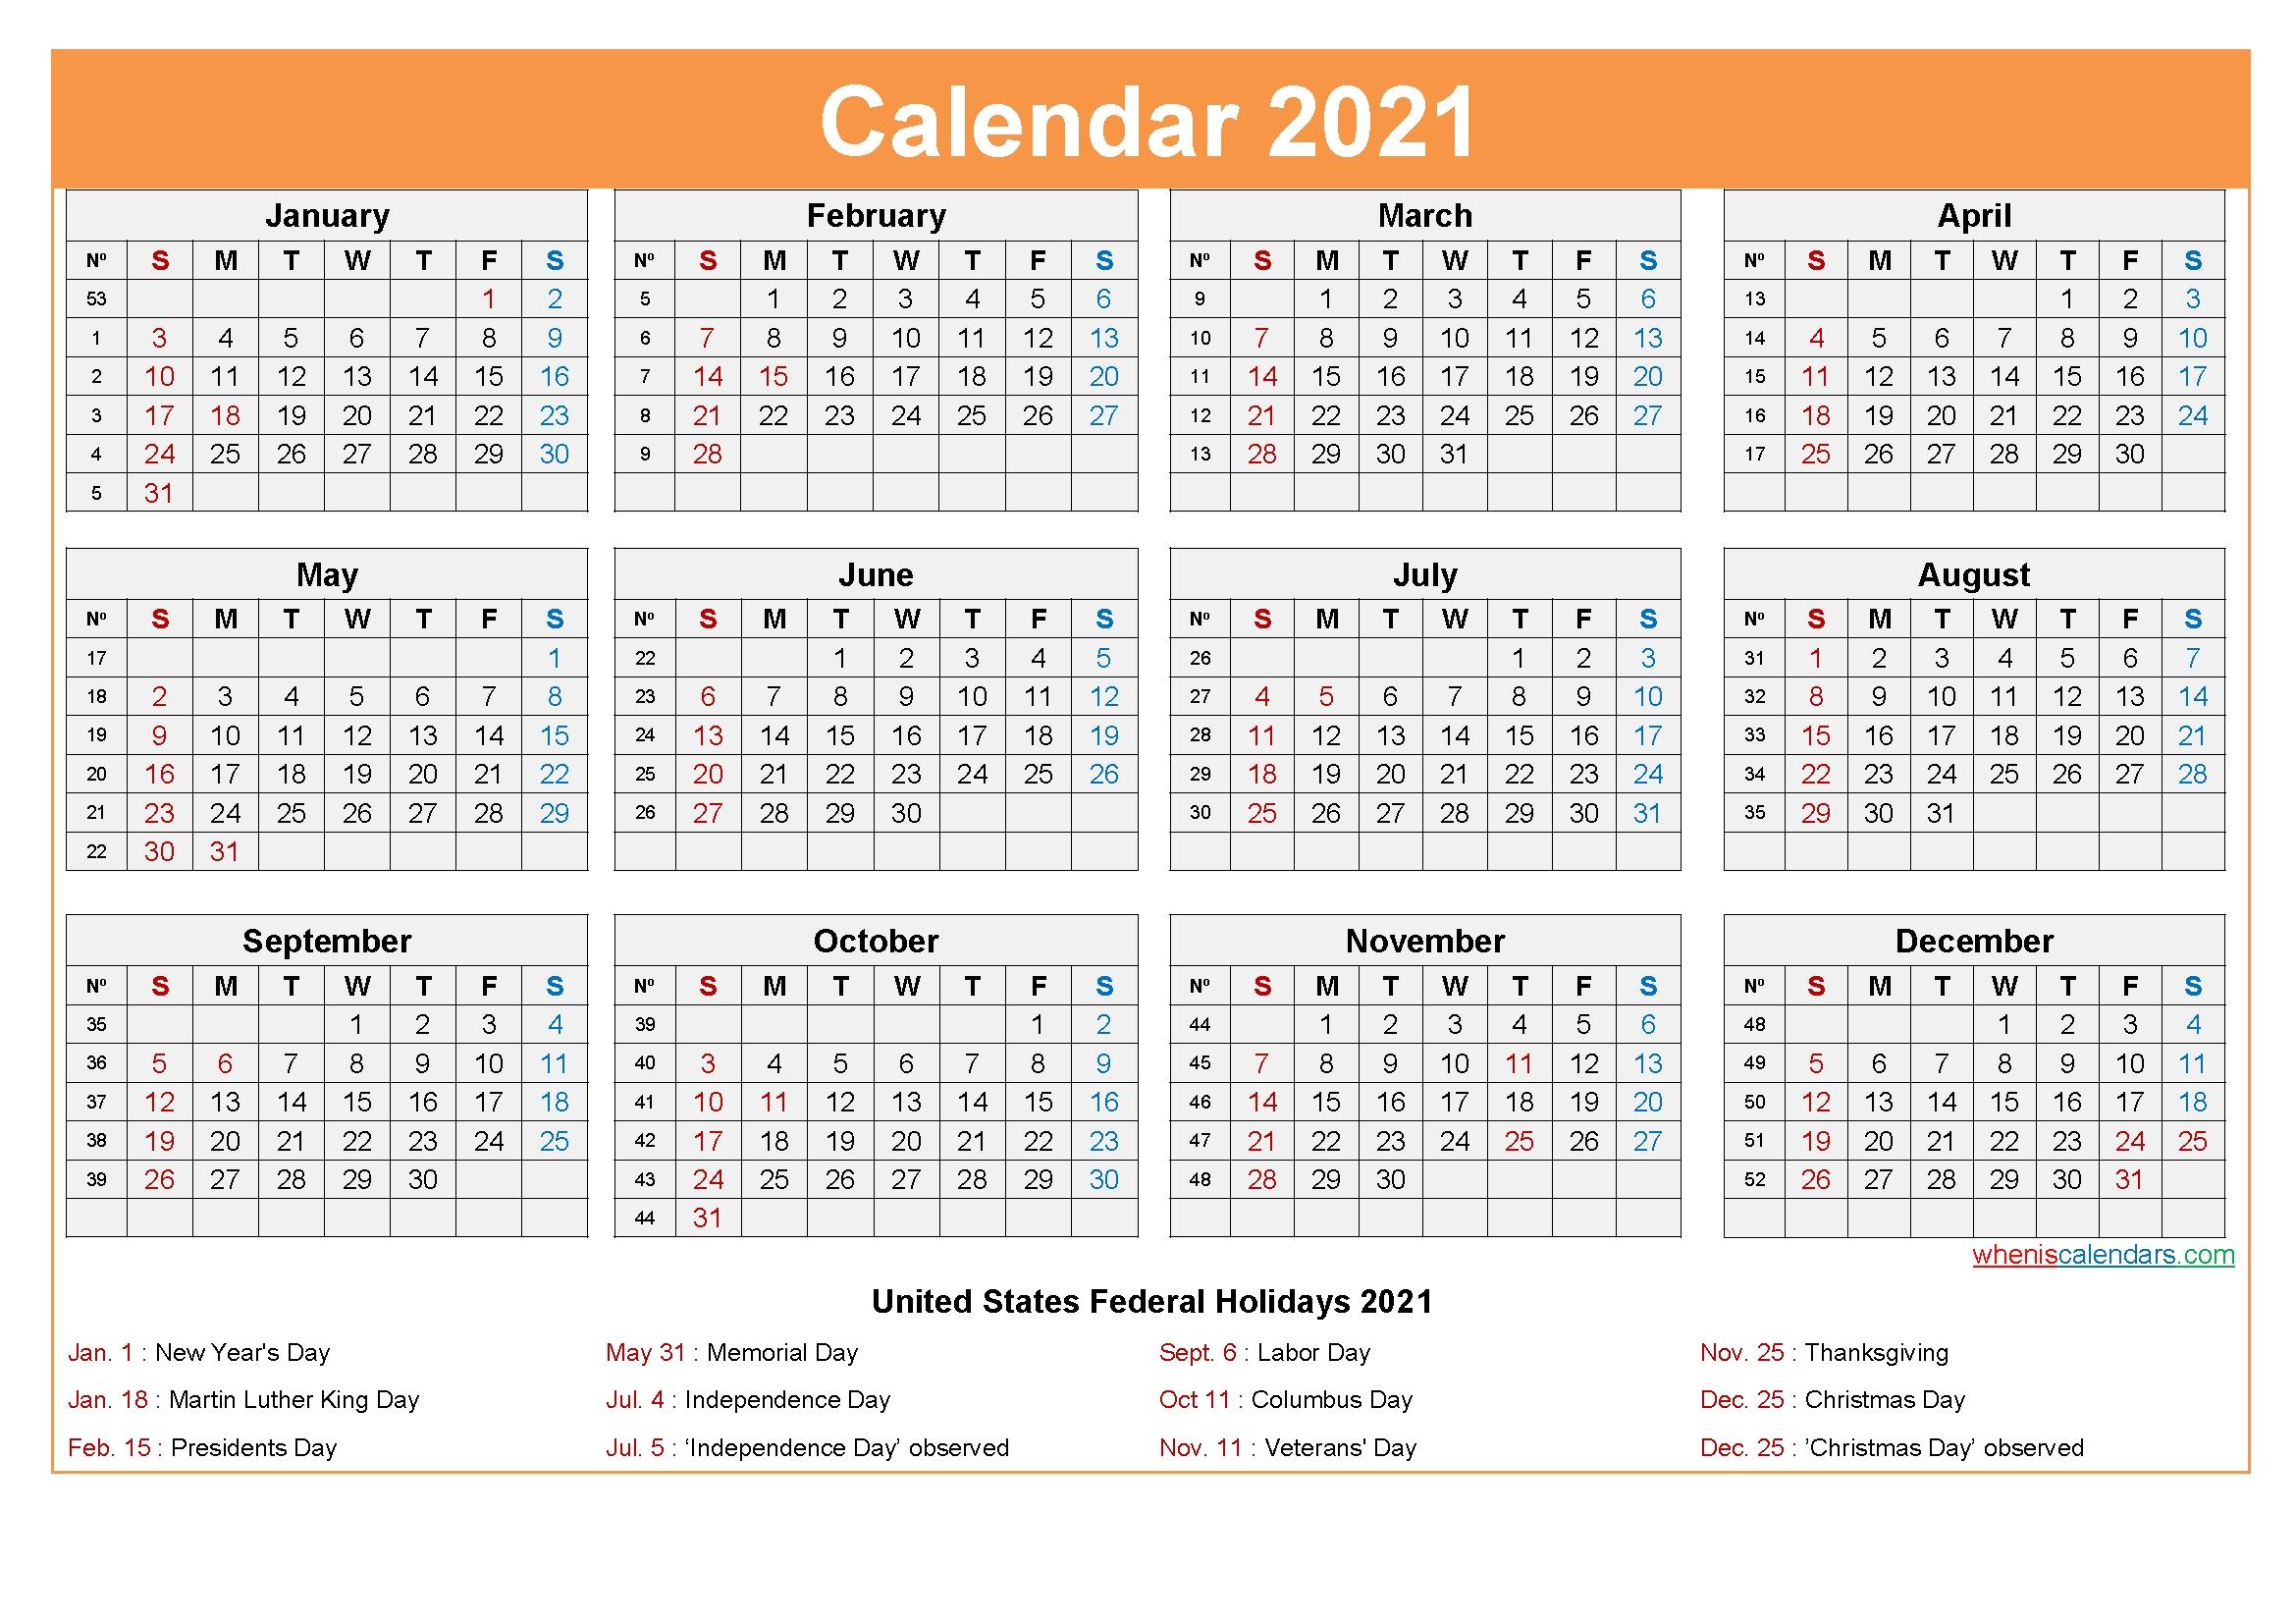 Free Printable 2021 Calendar With Holidays As Word, Pdf